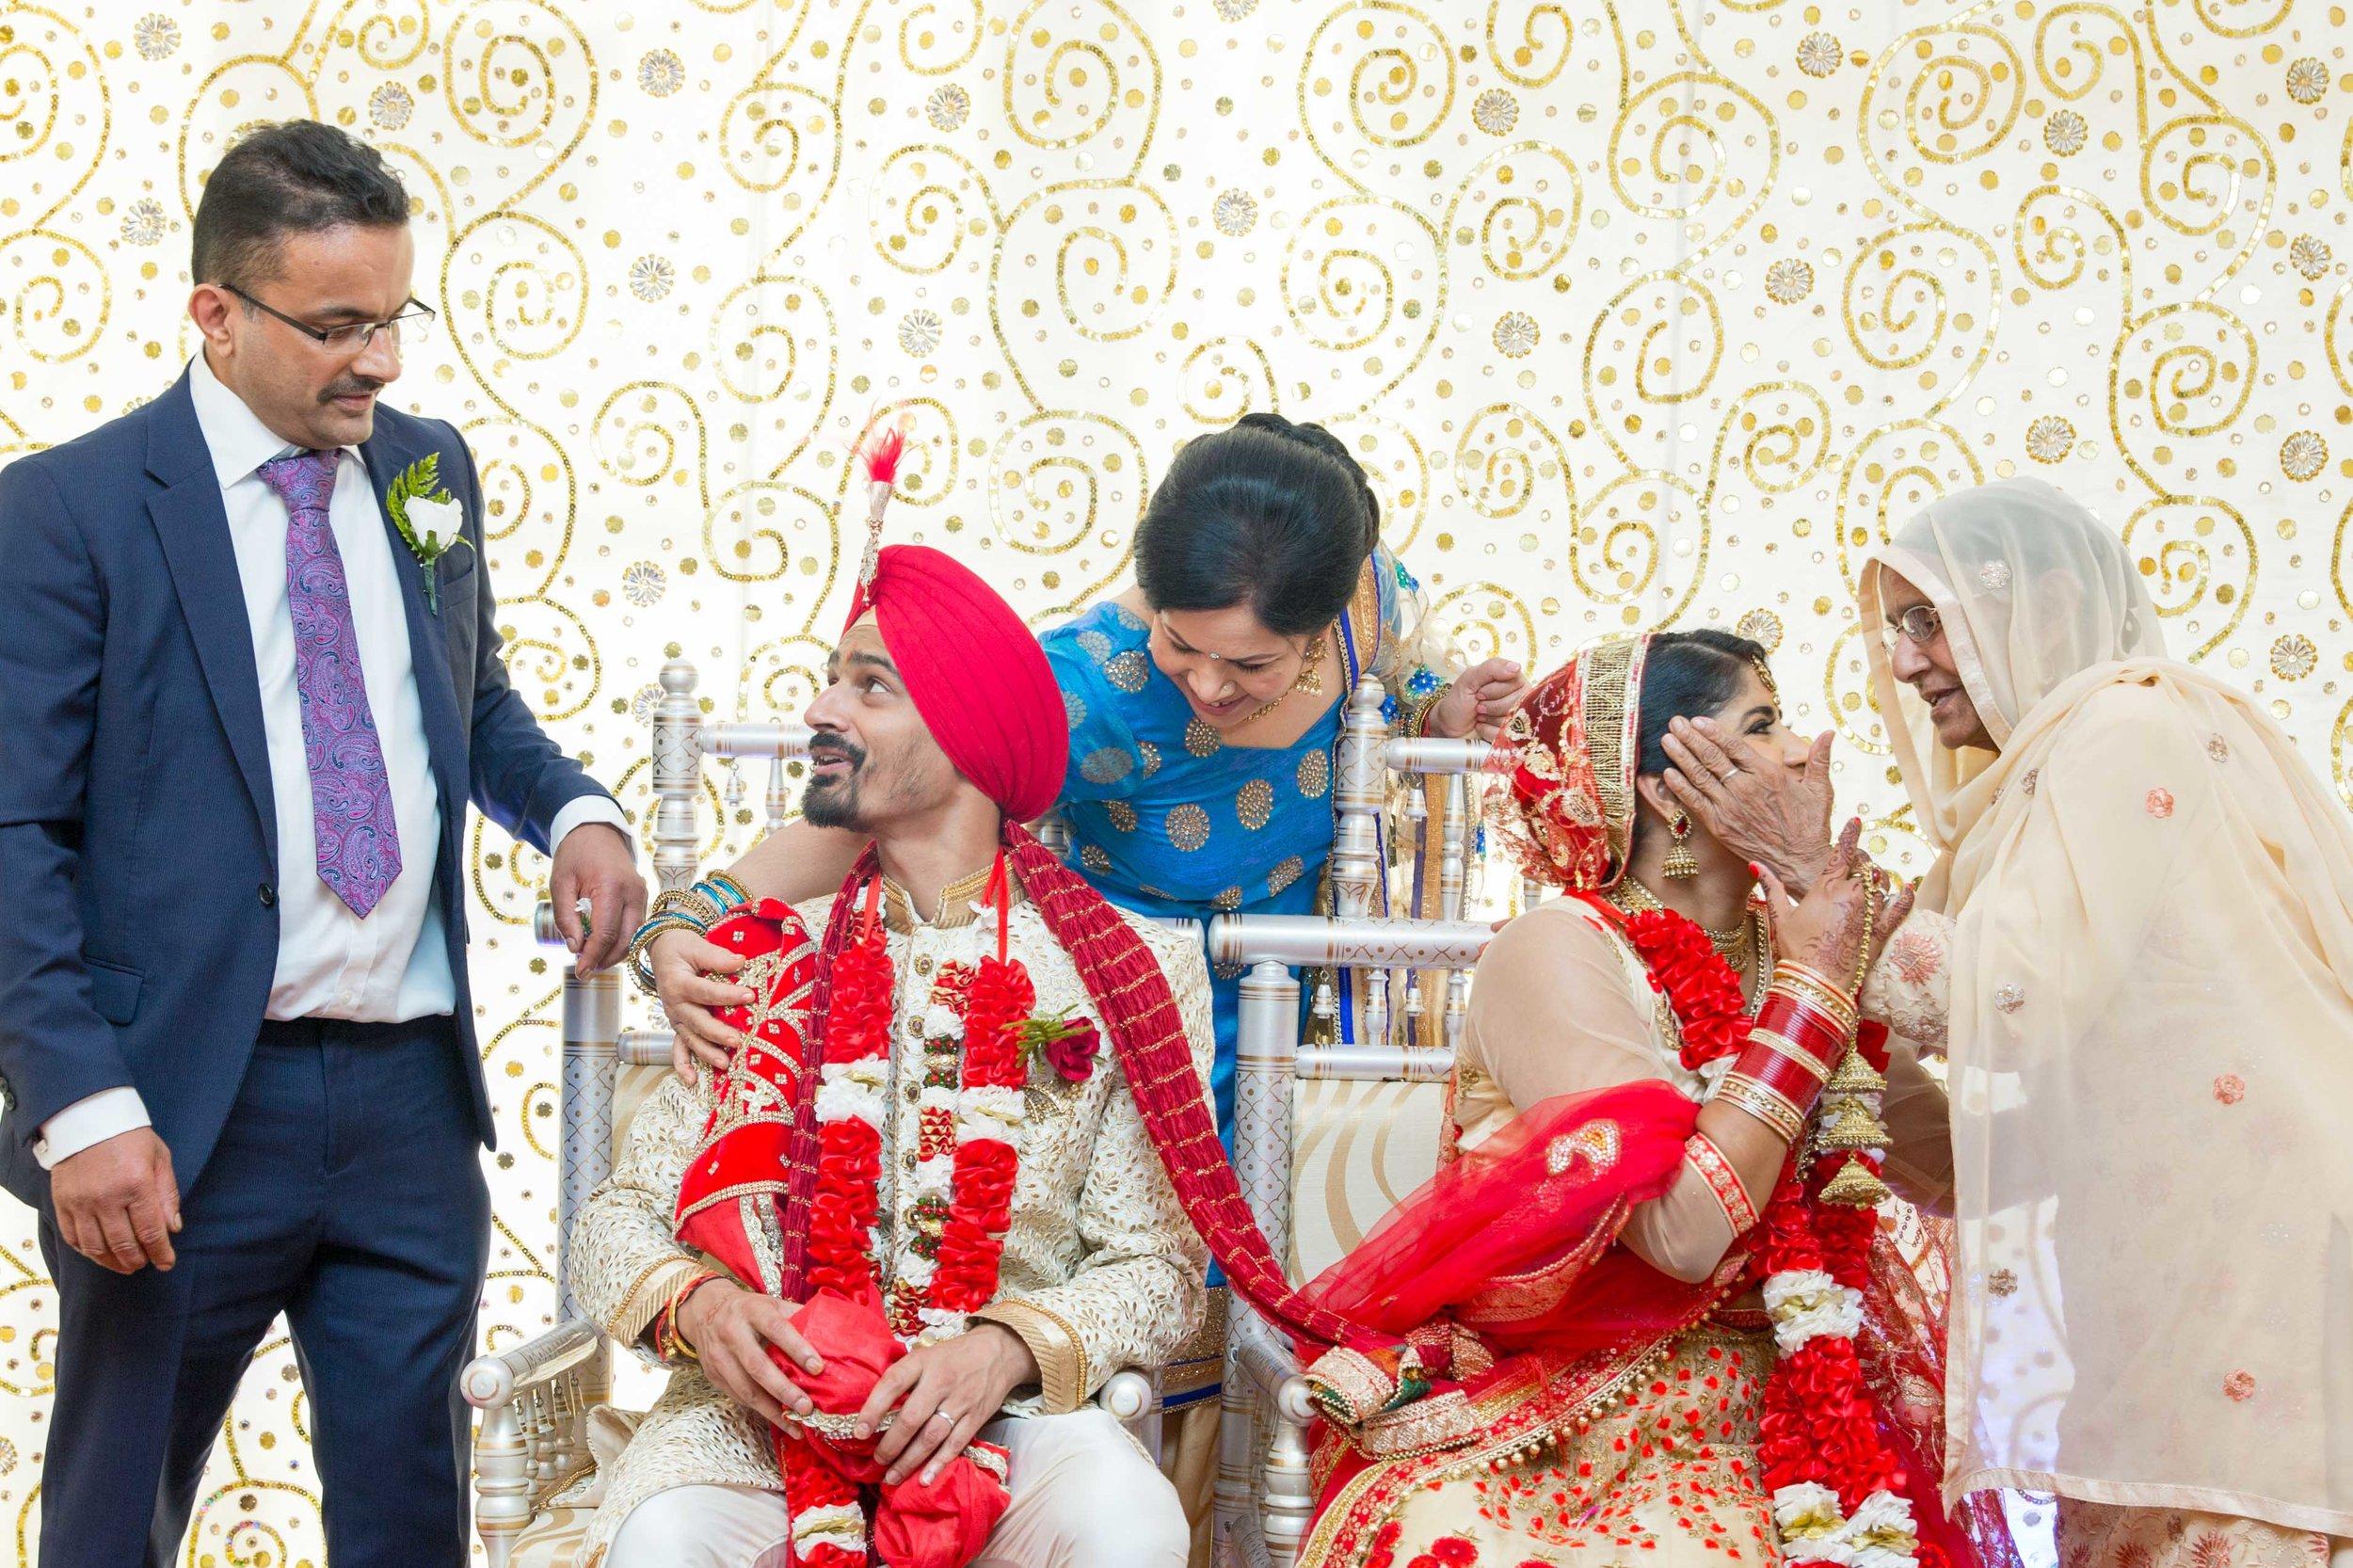 ramada-park-hall-hotel-birmingham-wolverhampton-hindu-wedding-asian-wedding-photography-natalia-smith-photography-29.jpg